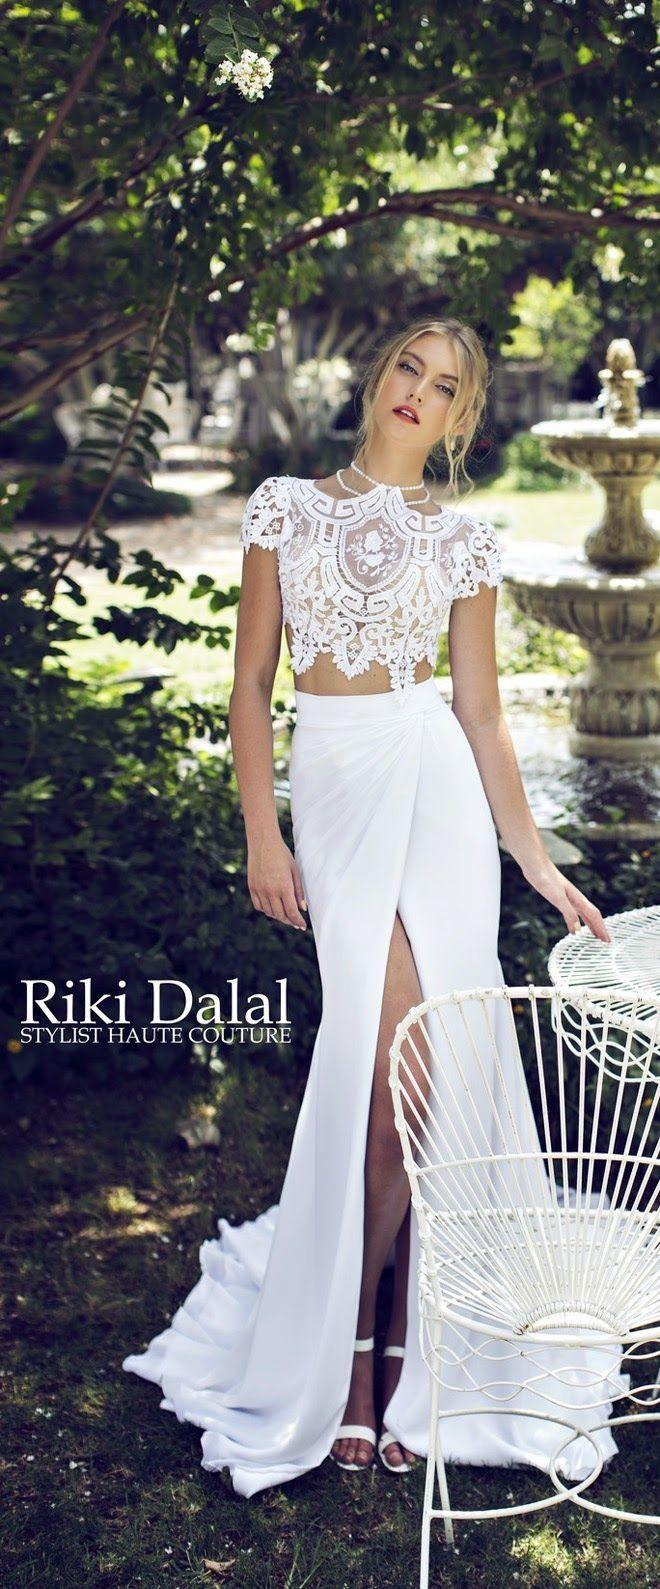 Hochzeit - Riki Dalal Wedding Dresses